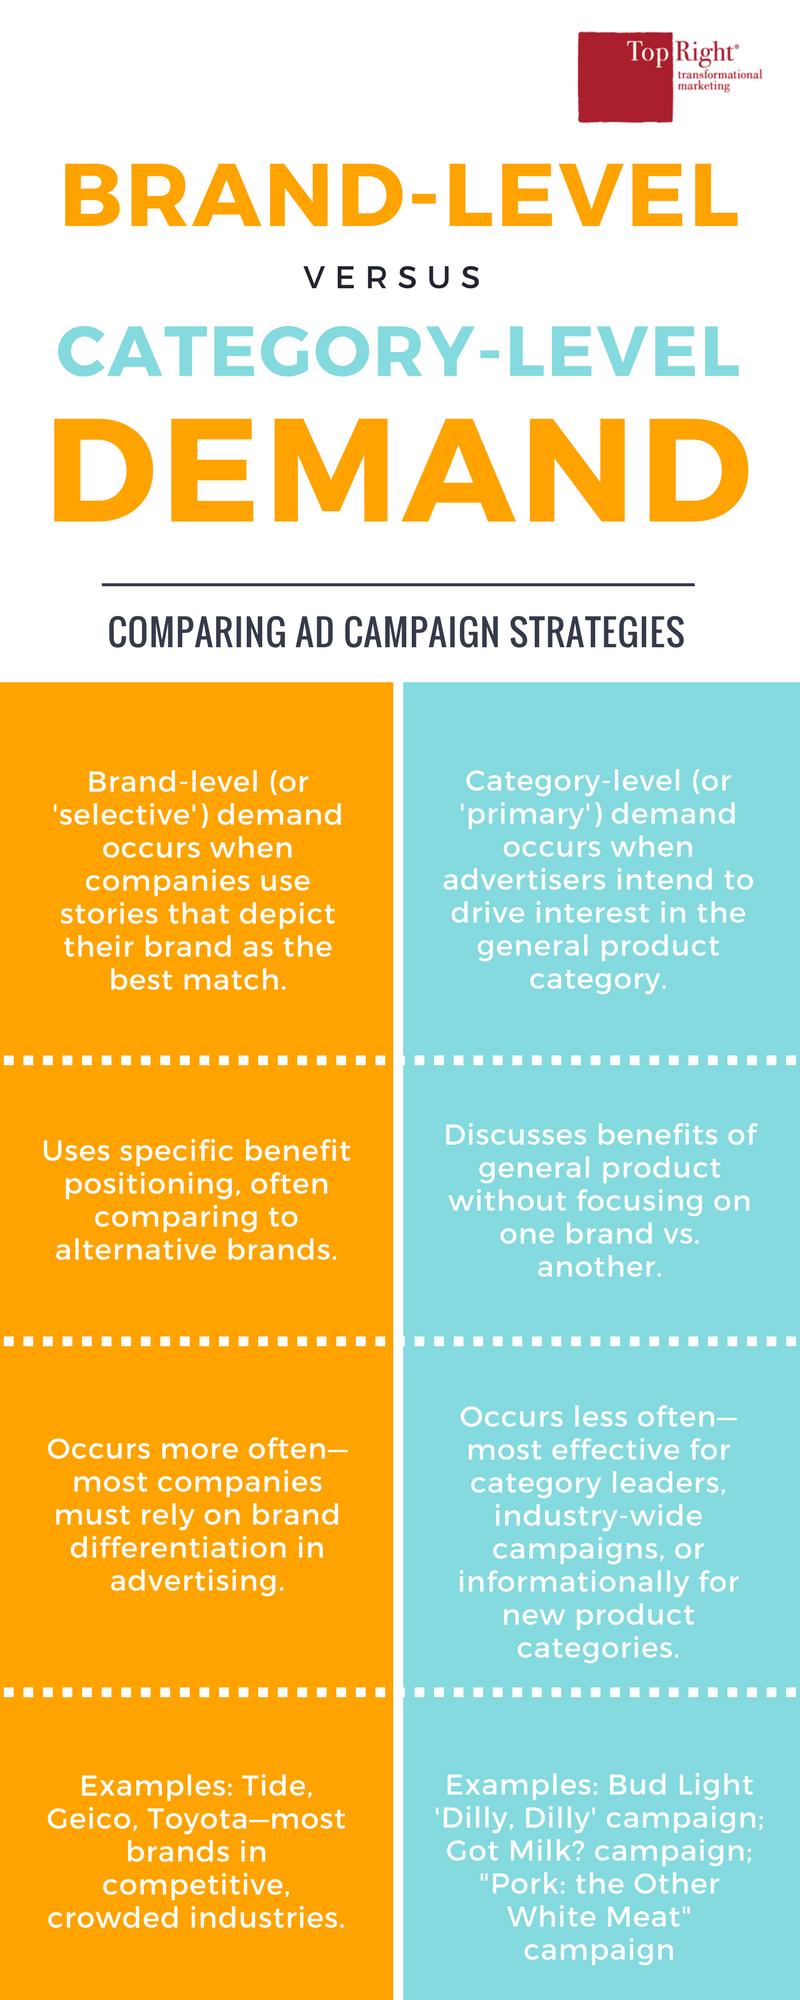 Selective vs. Primary Demand Strategies